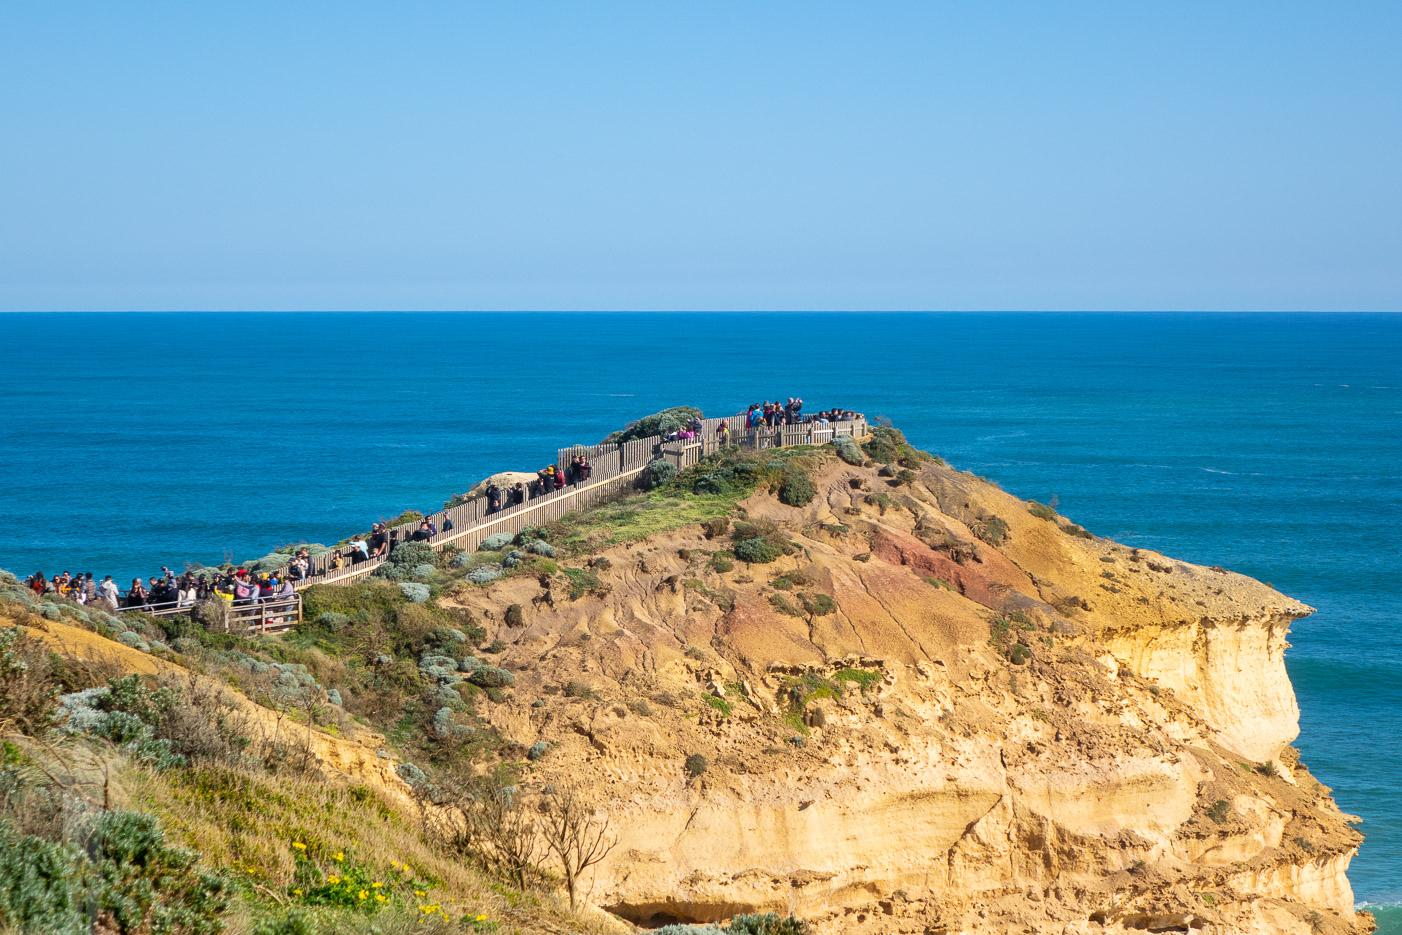 Turiststråk vid Tolv Apostlarna